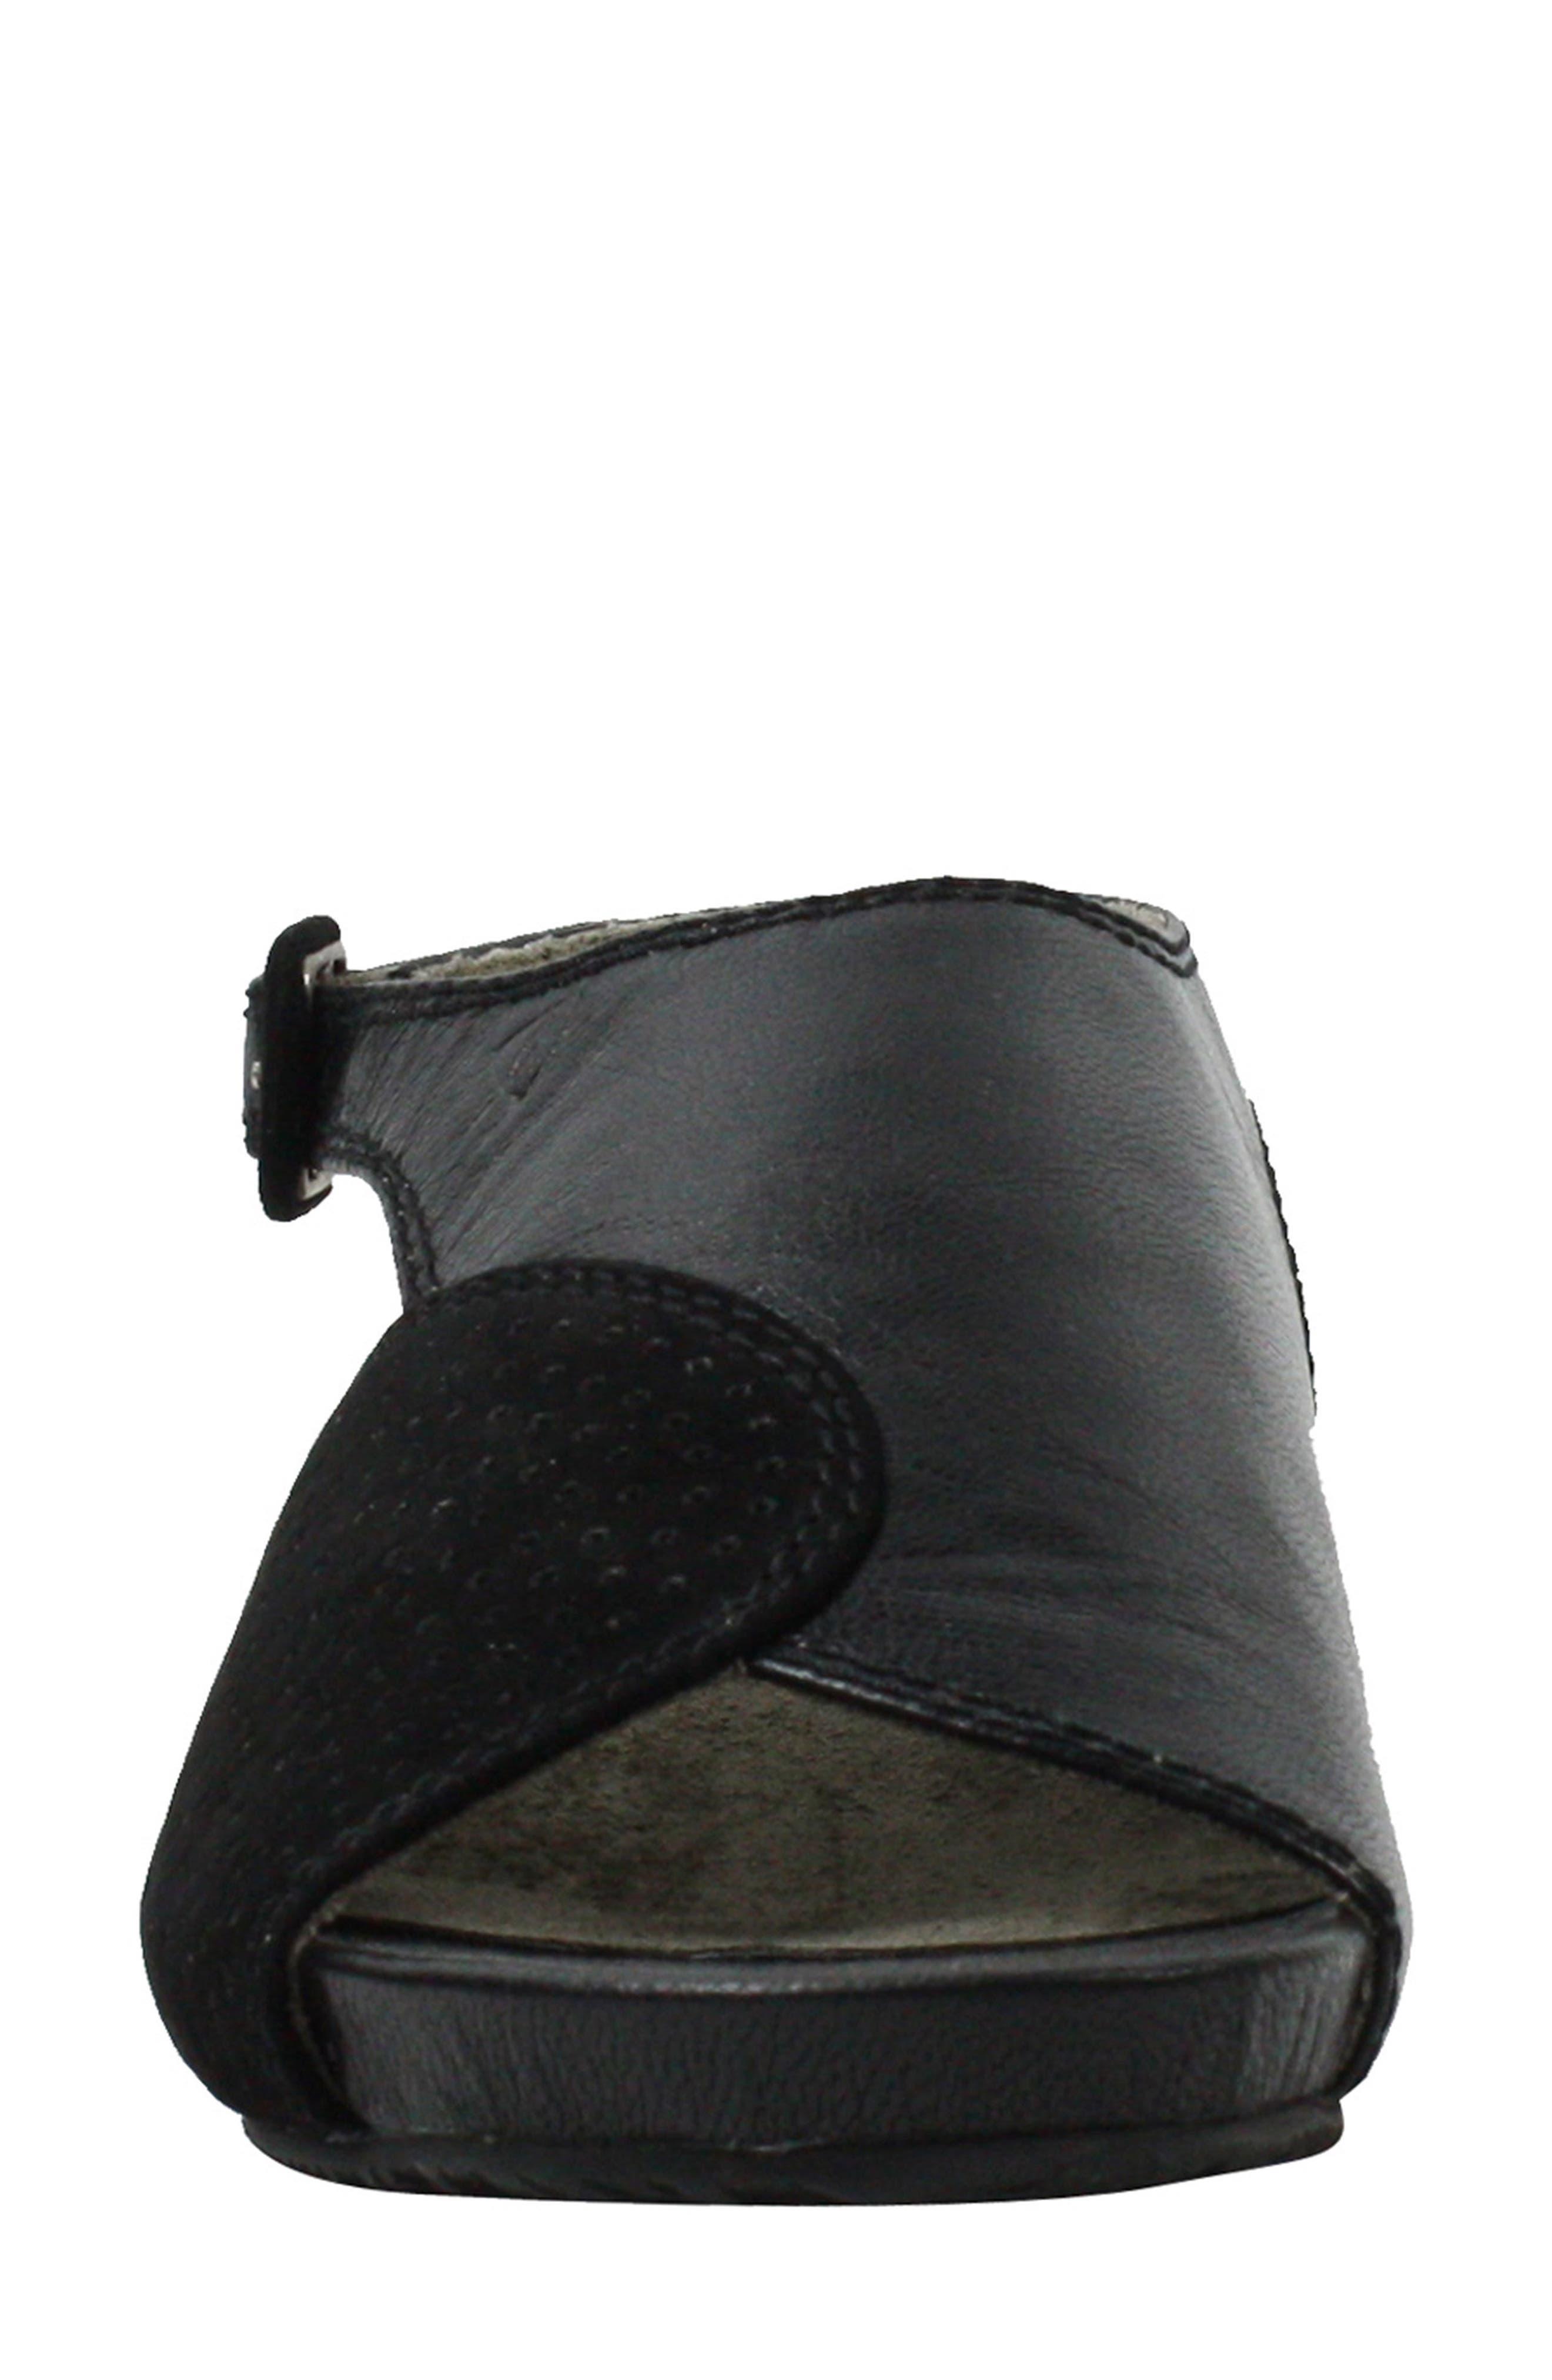 Dalenna Ankle Strap Sandal,                             Alternate thumbnail 4, color,                             Black Leather